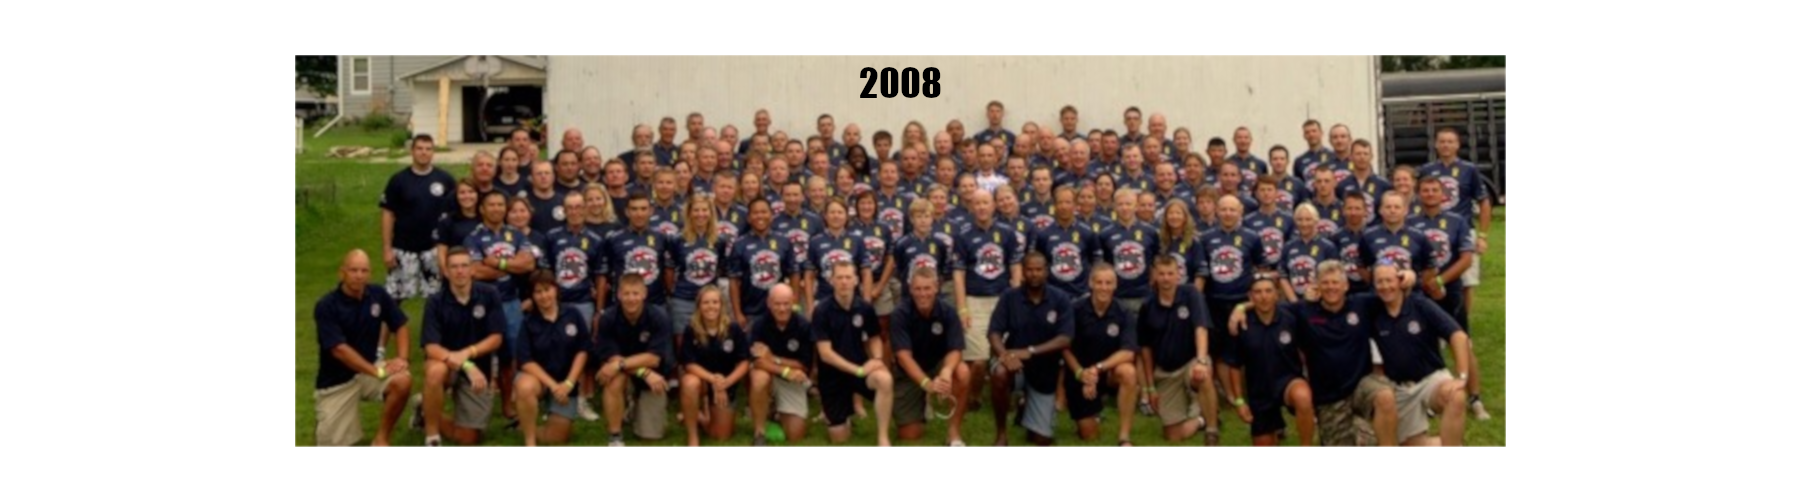 2008Banner